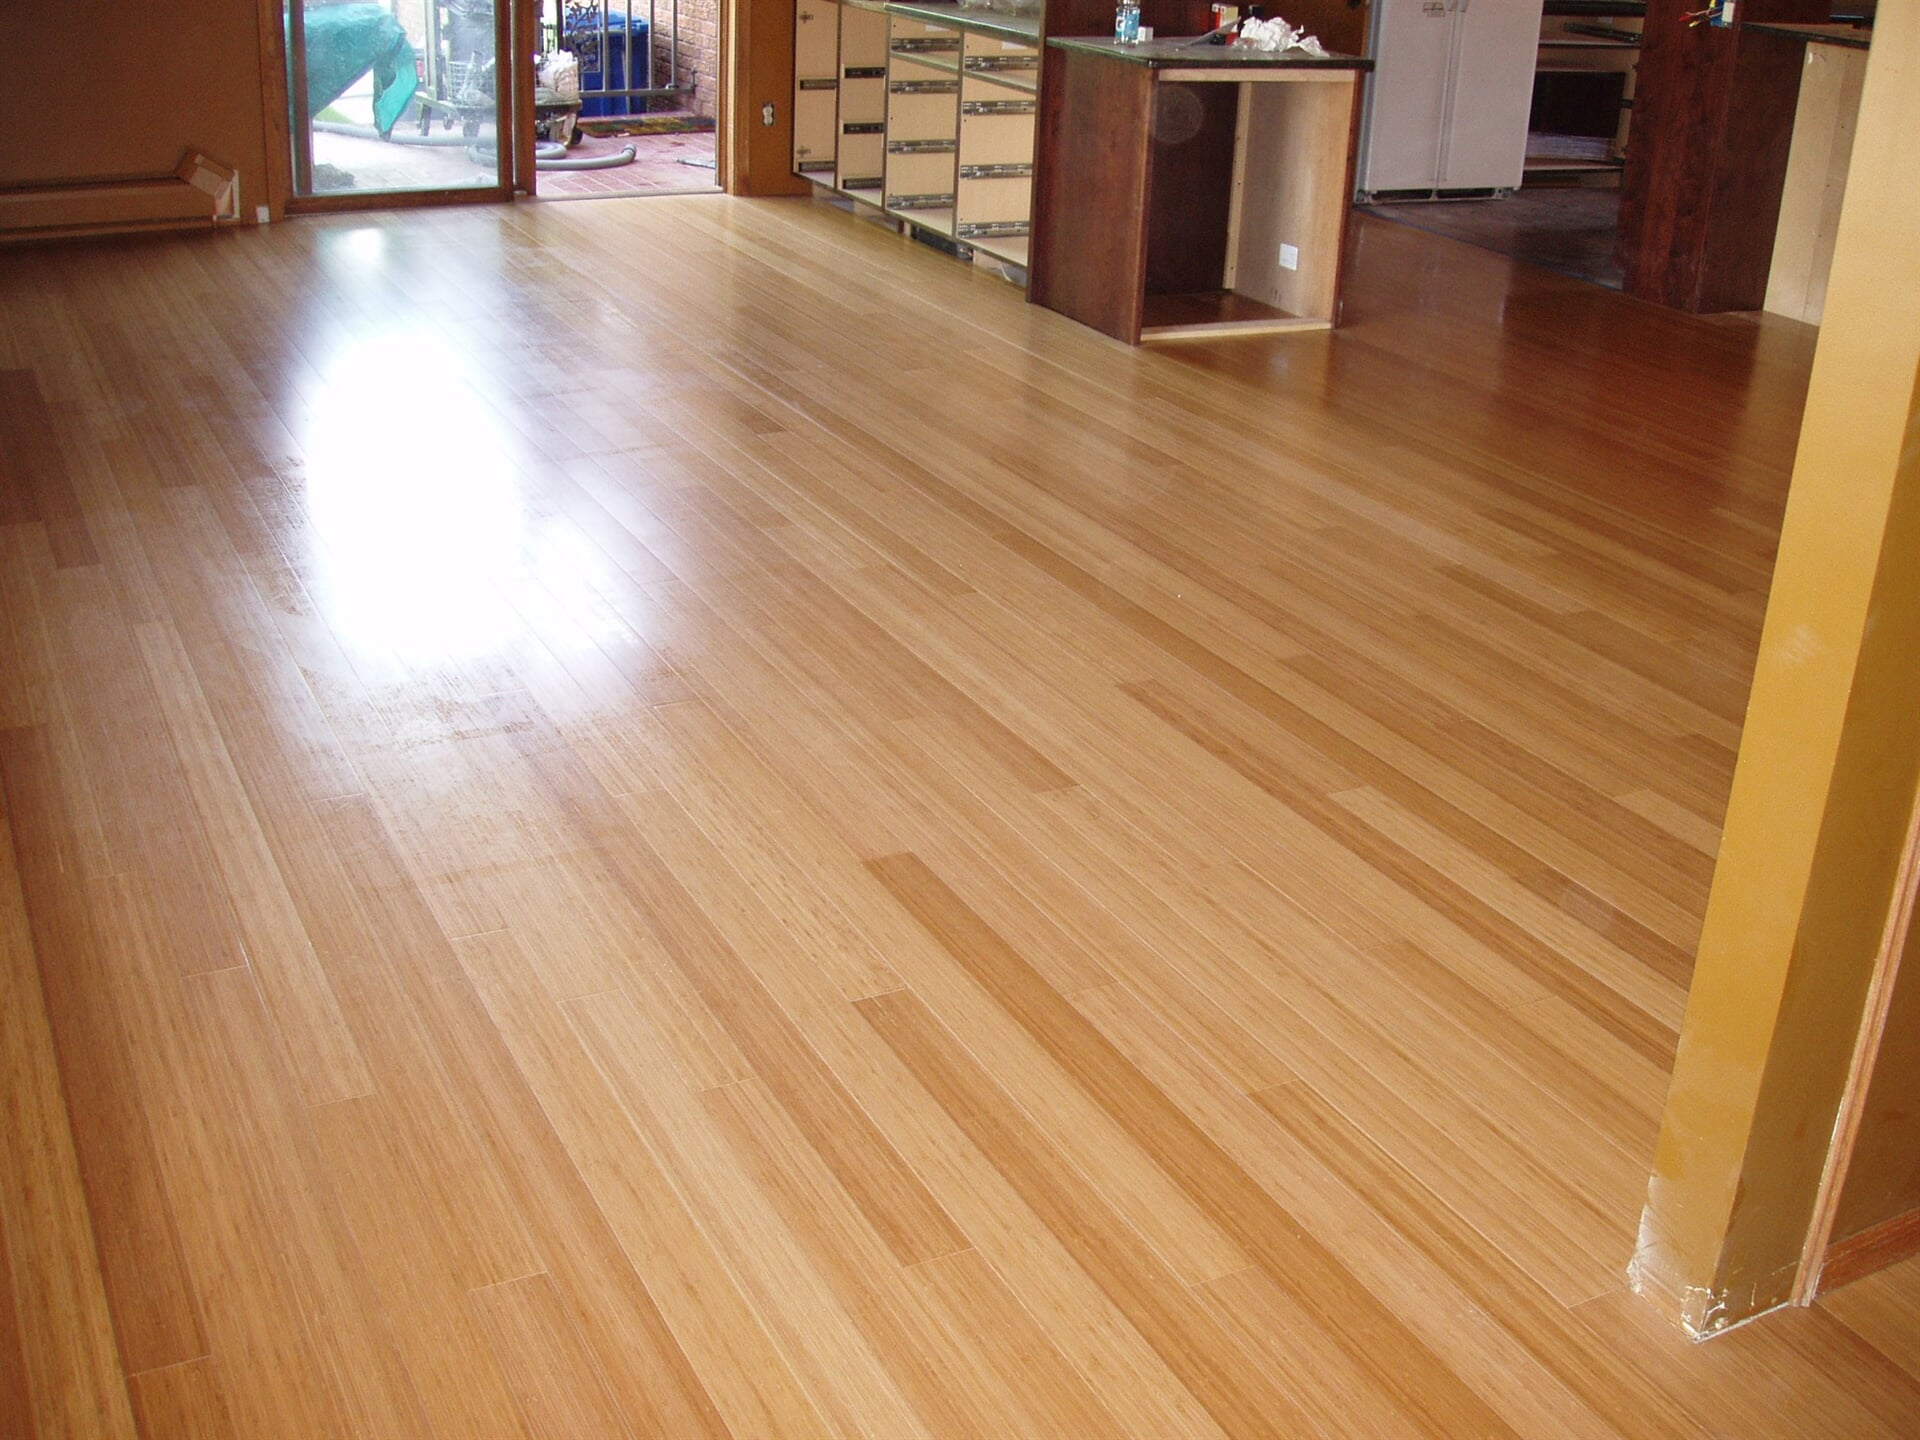 Hardwood flooring at Schmidt Custom Floors in Boulder, CO